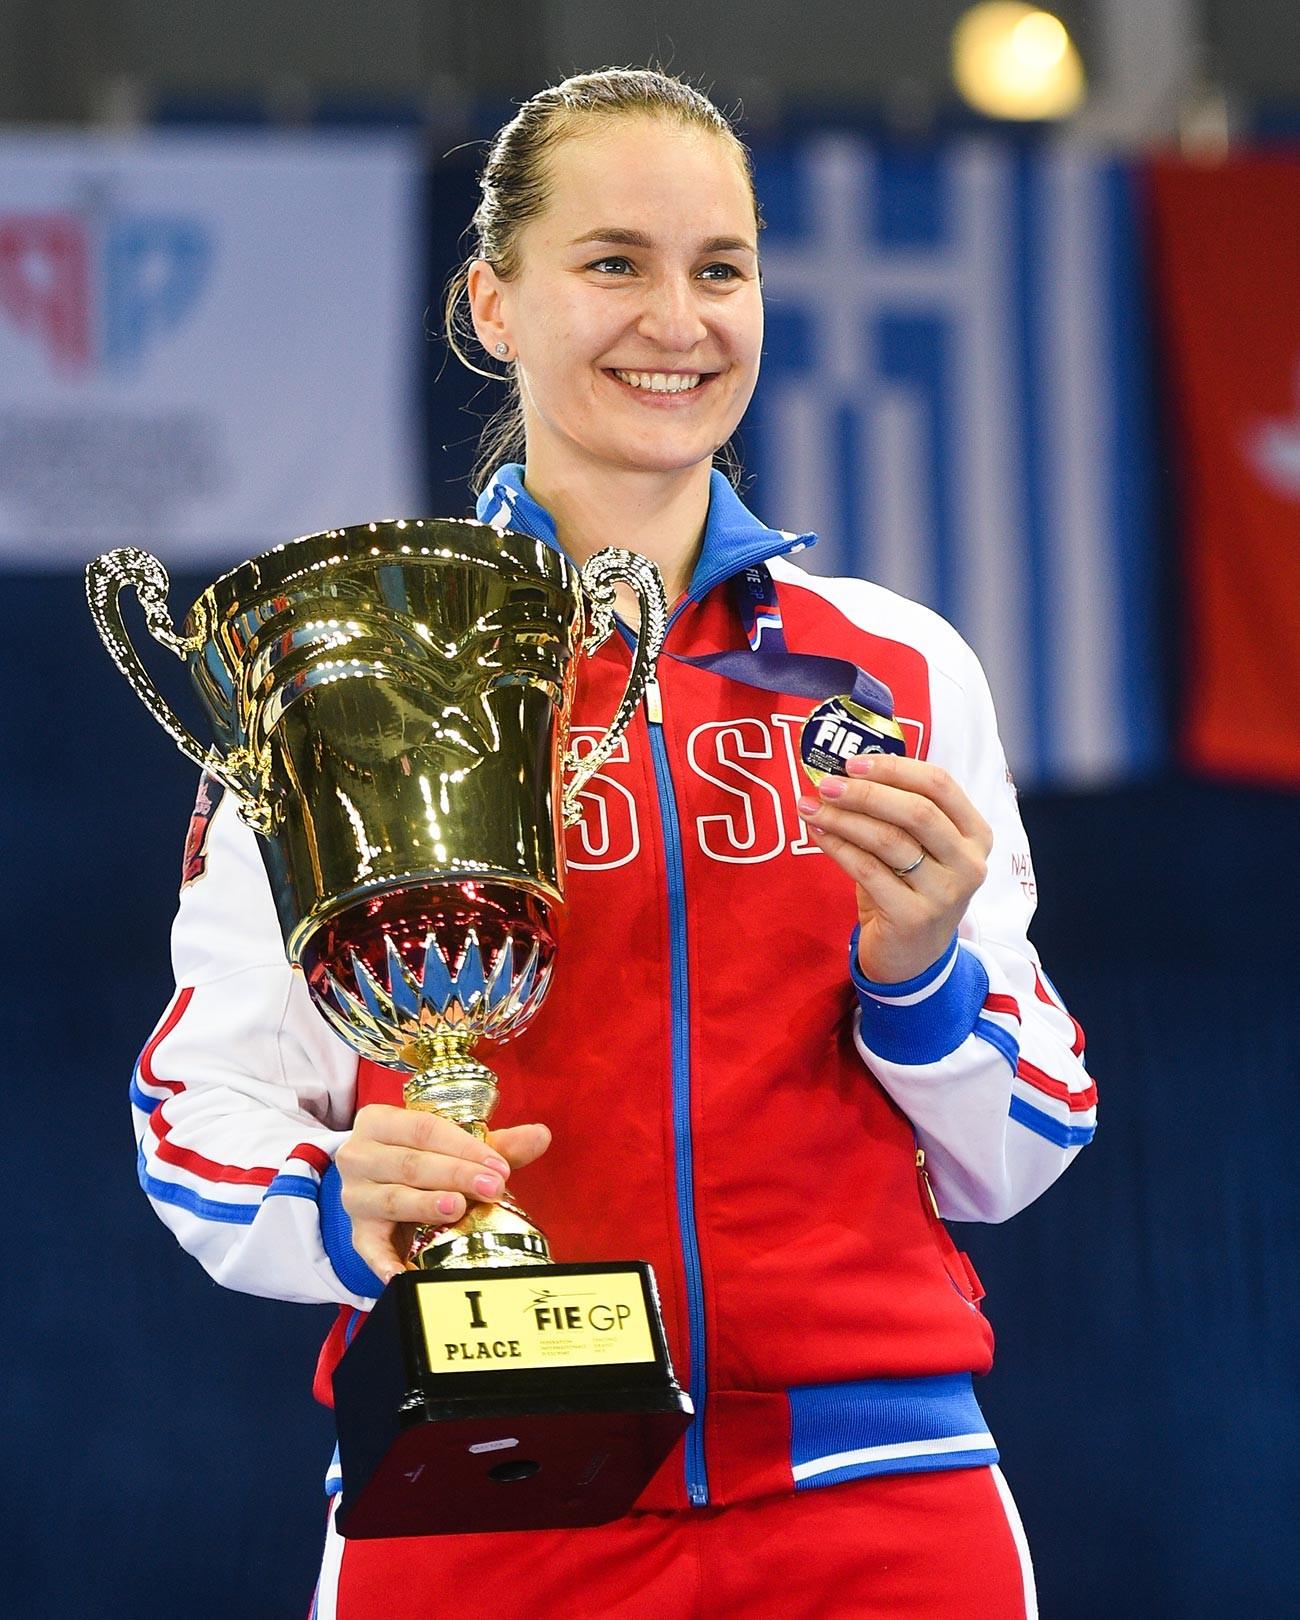 Pobjednica u ženskom prvenstvu na međunarodnom turniru mačevanja